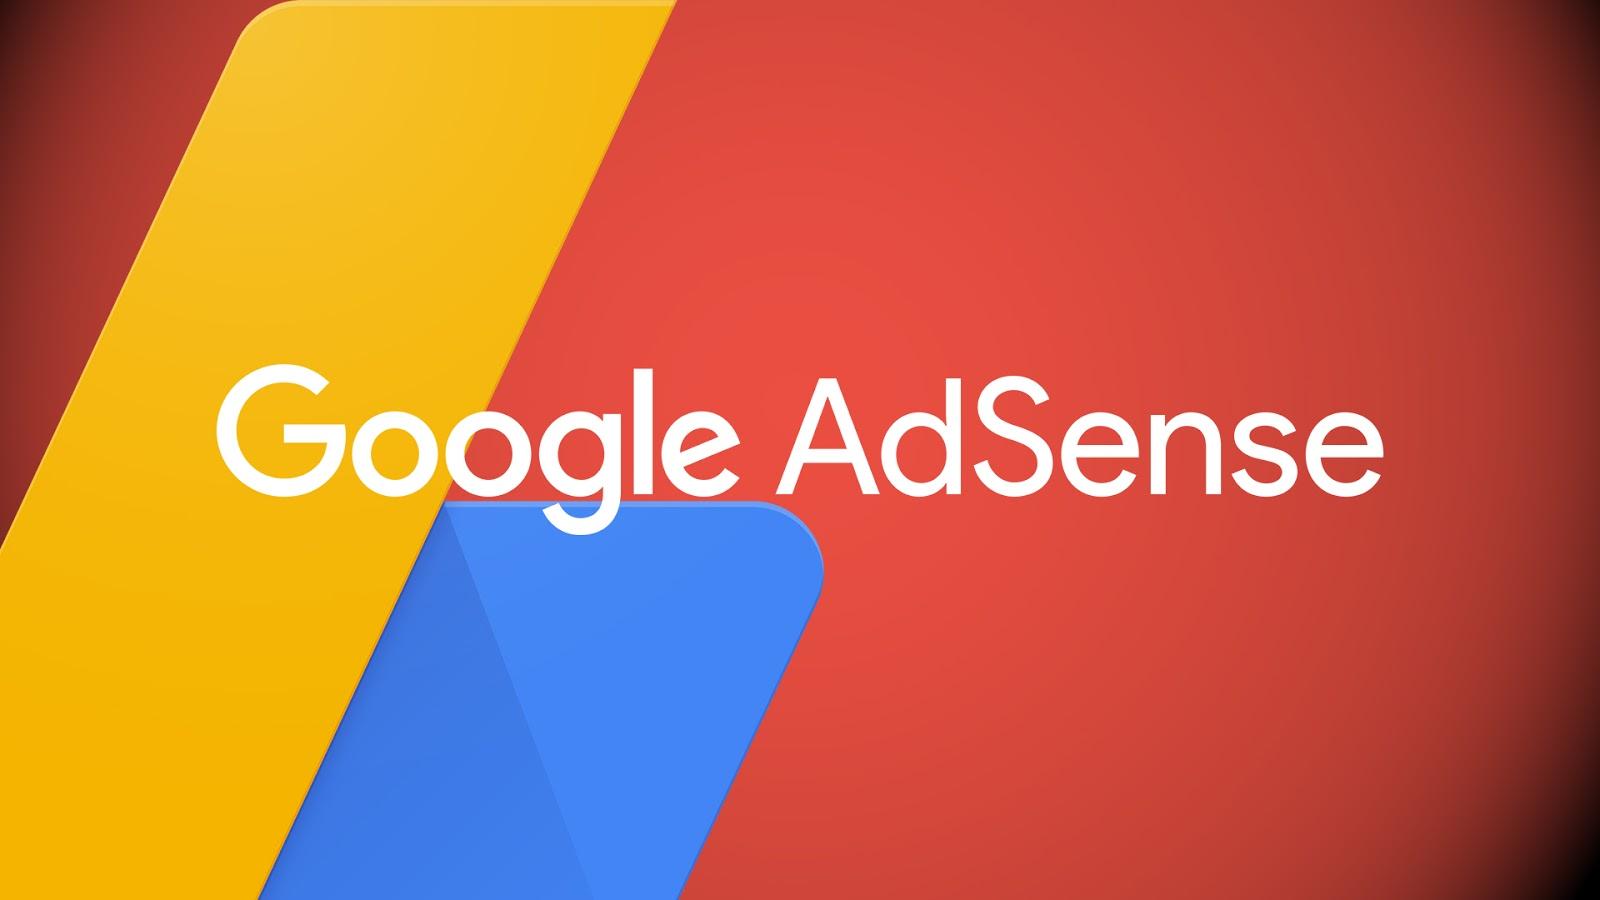 World Tech News 24 ! Stay For All Update News: 7 Google